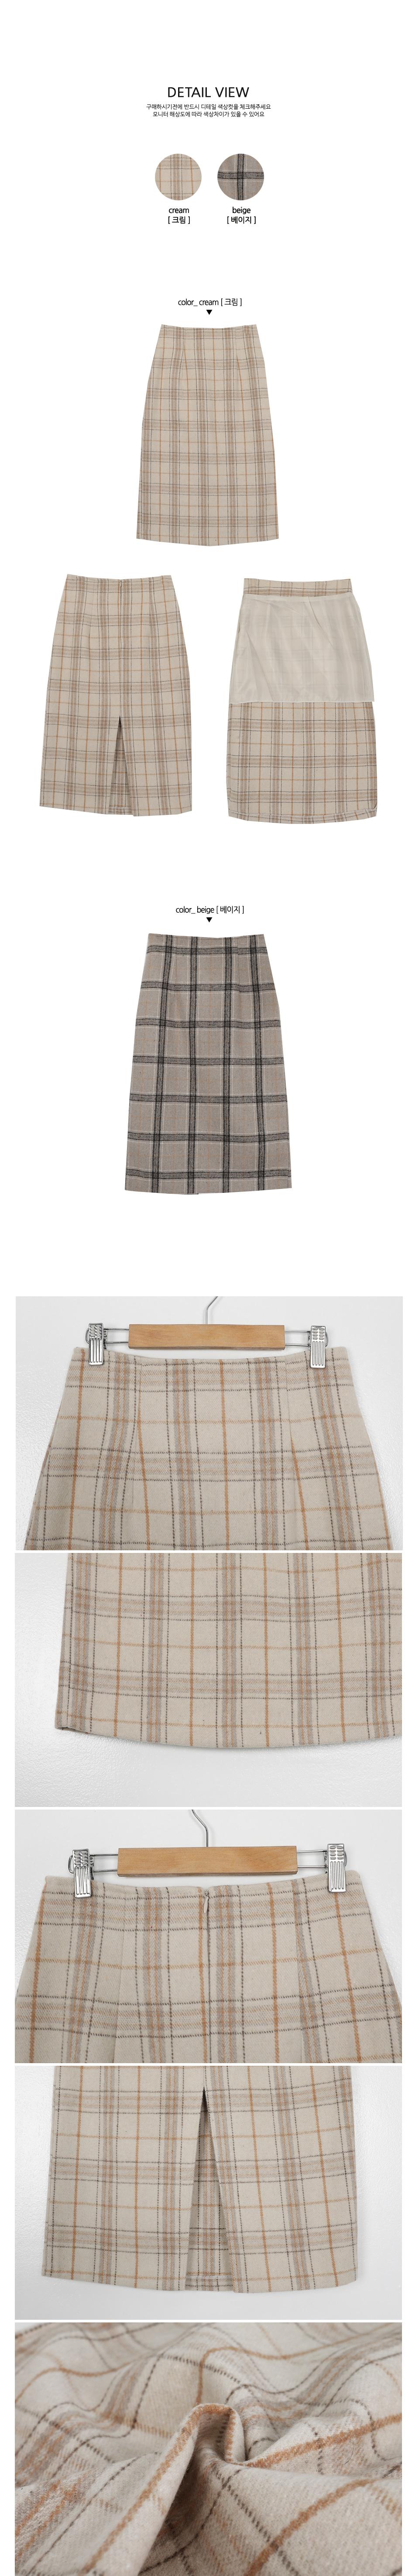 Matilda check udon skirt